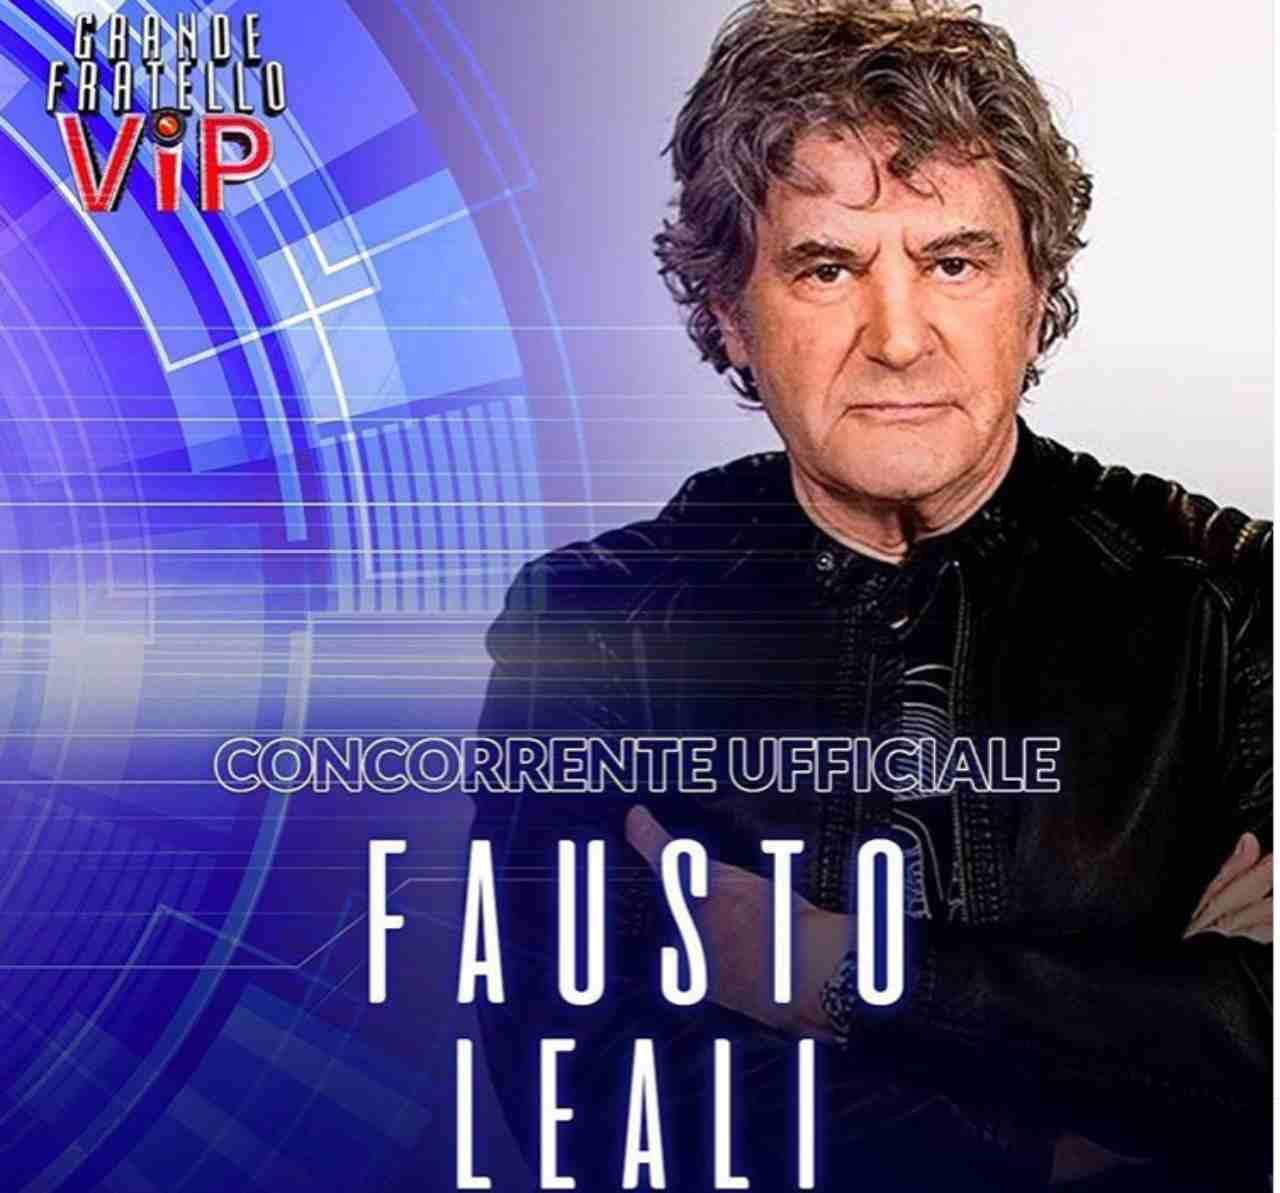 Fausto Leali